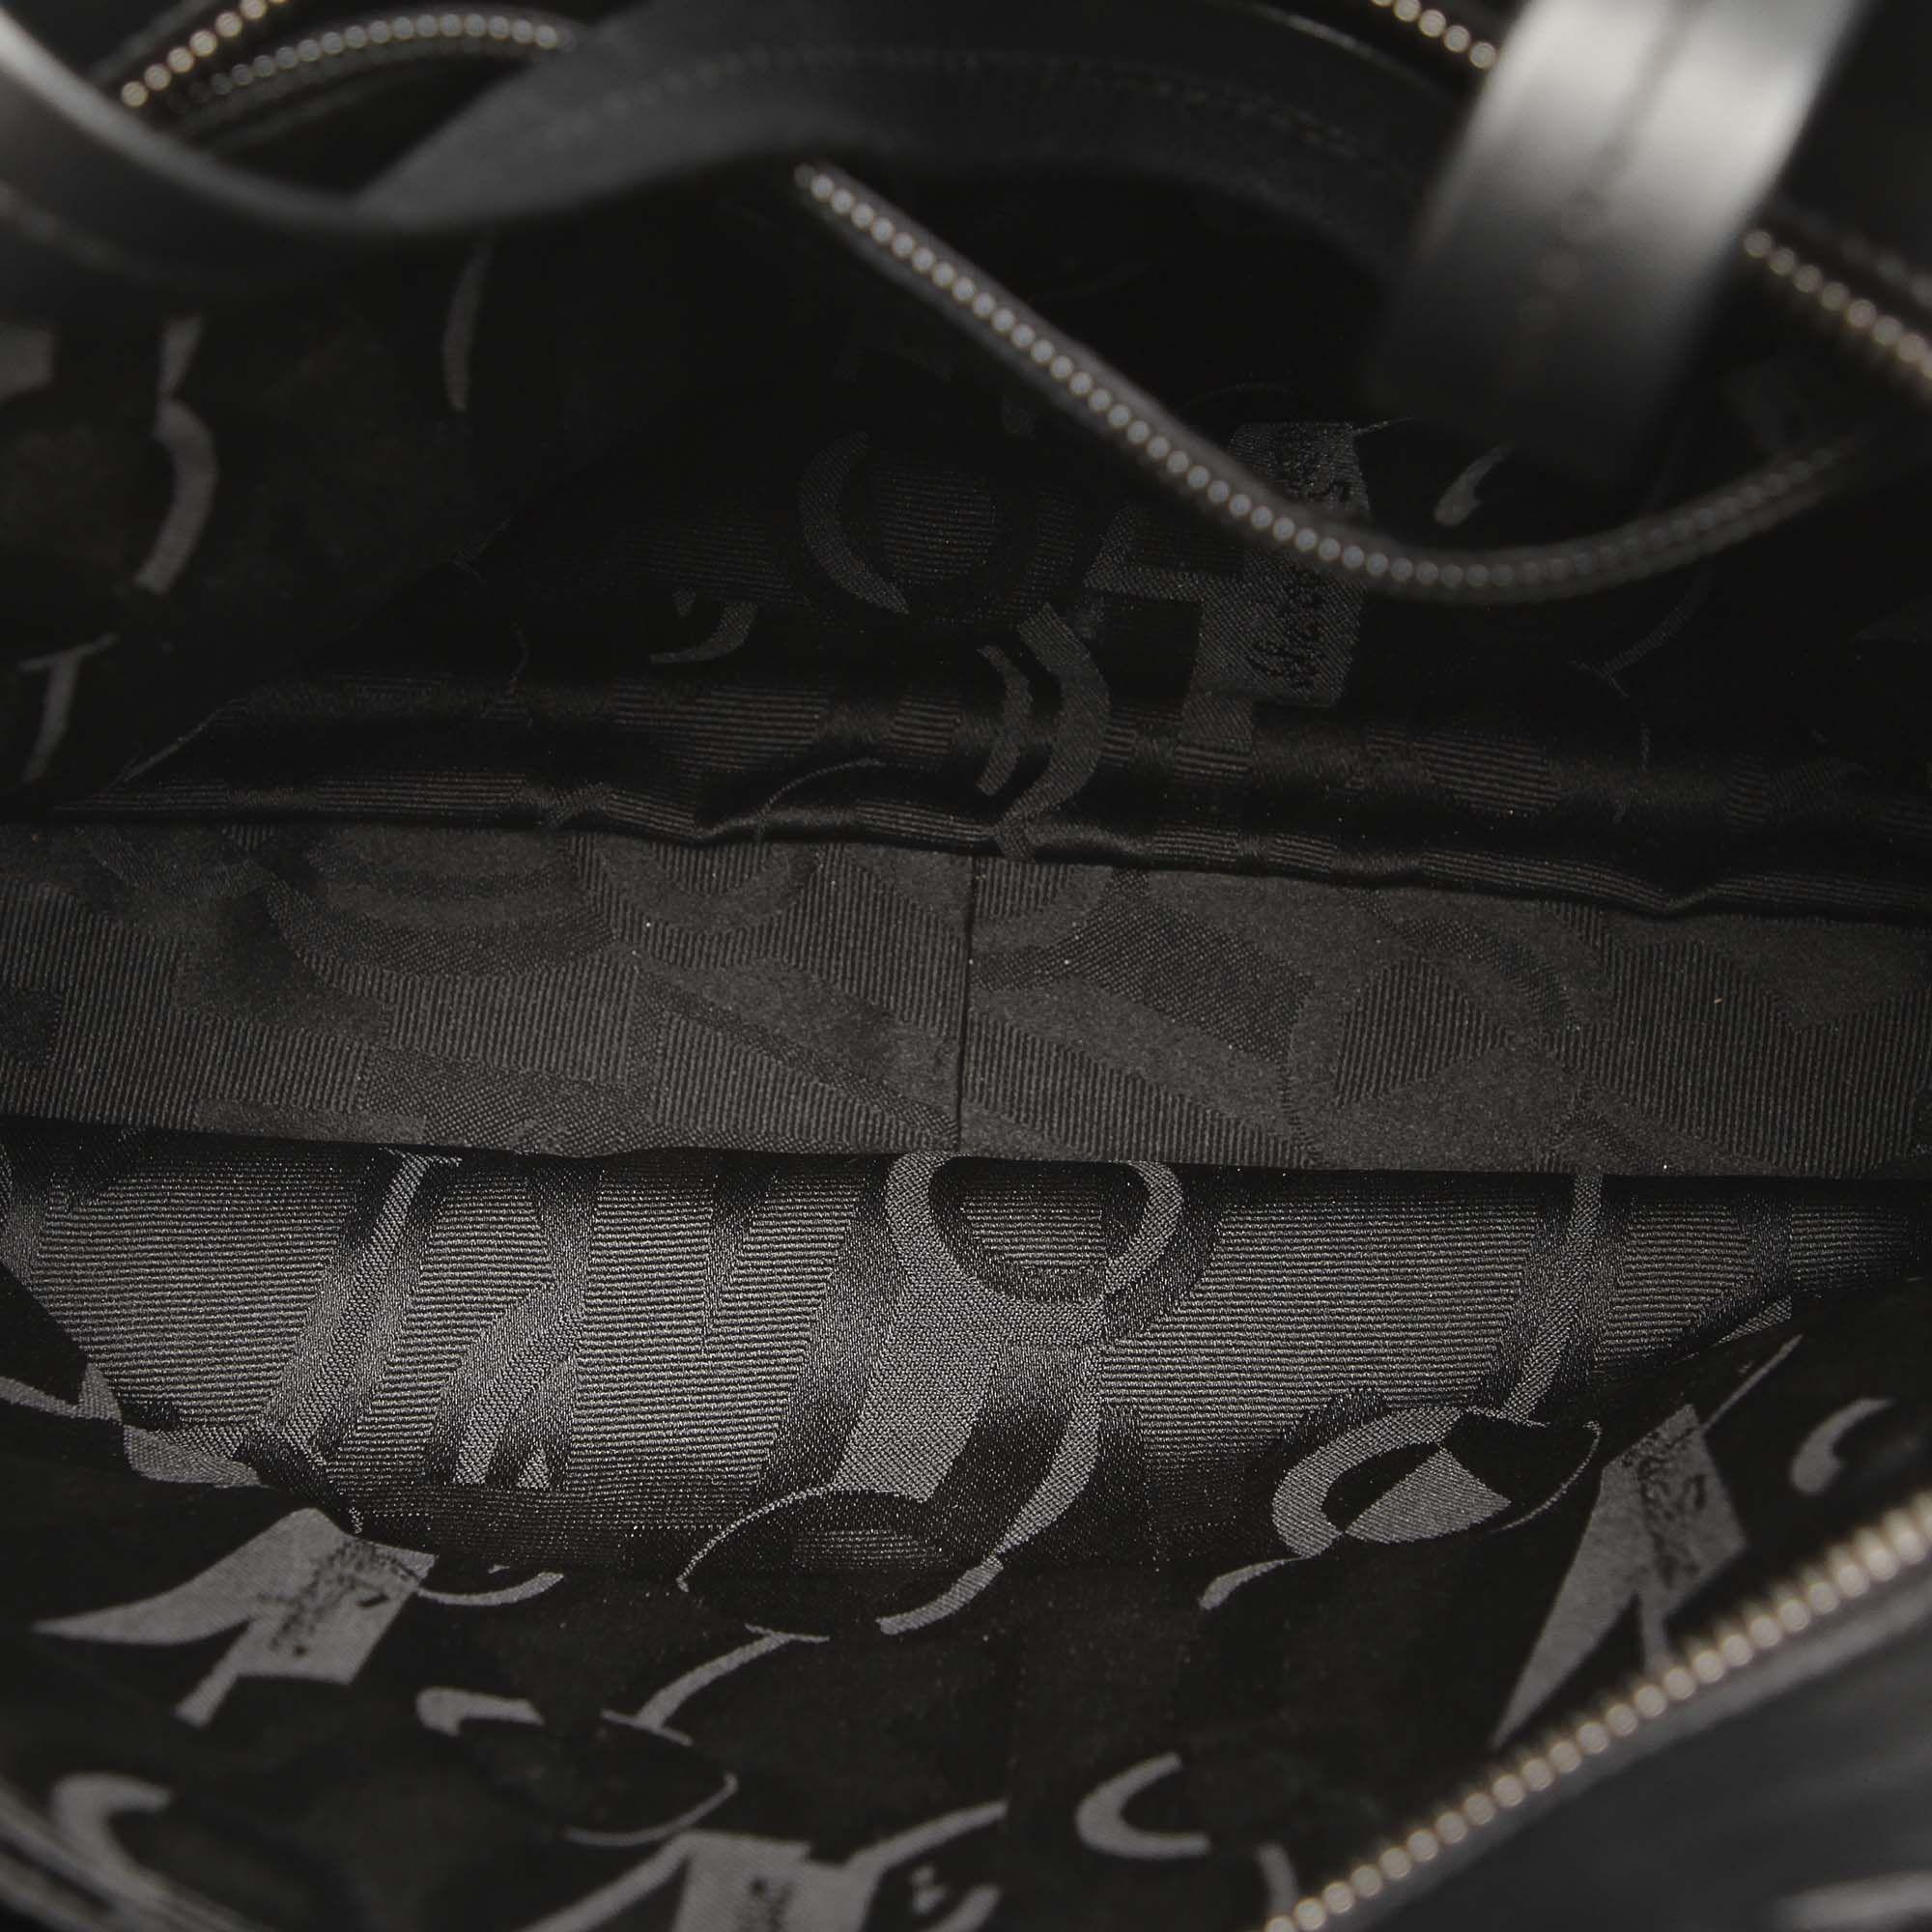 Vintage Ferragamo Gancini Leather Tote Bag Black